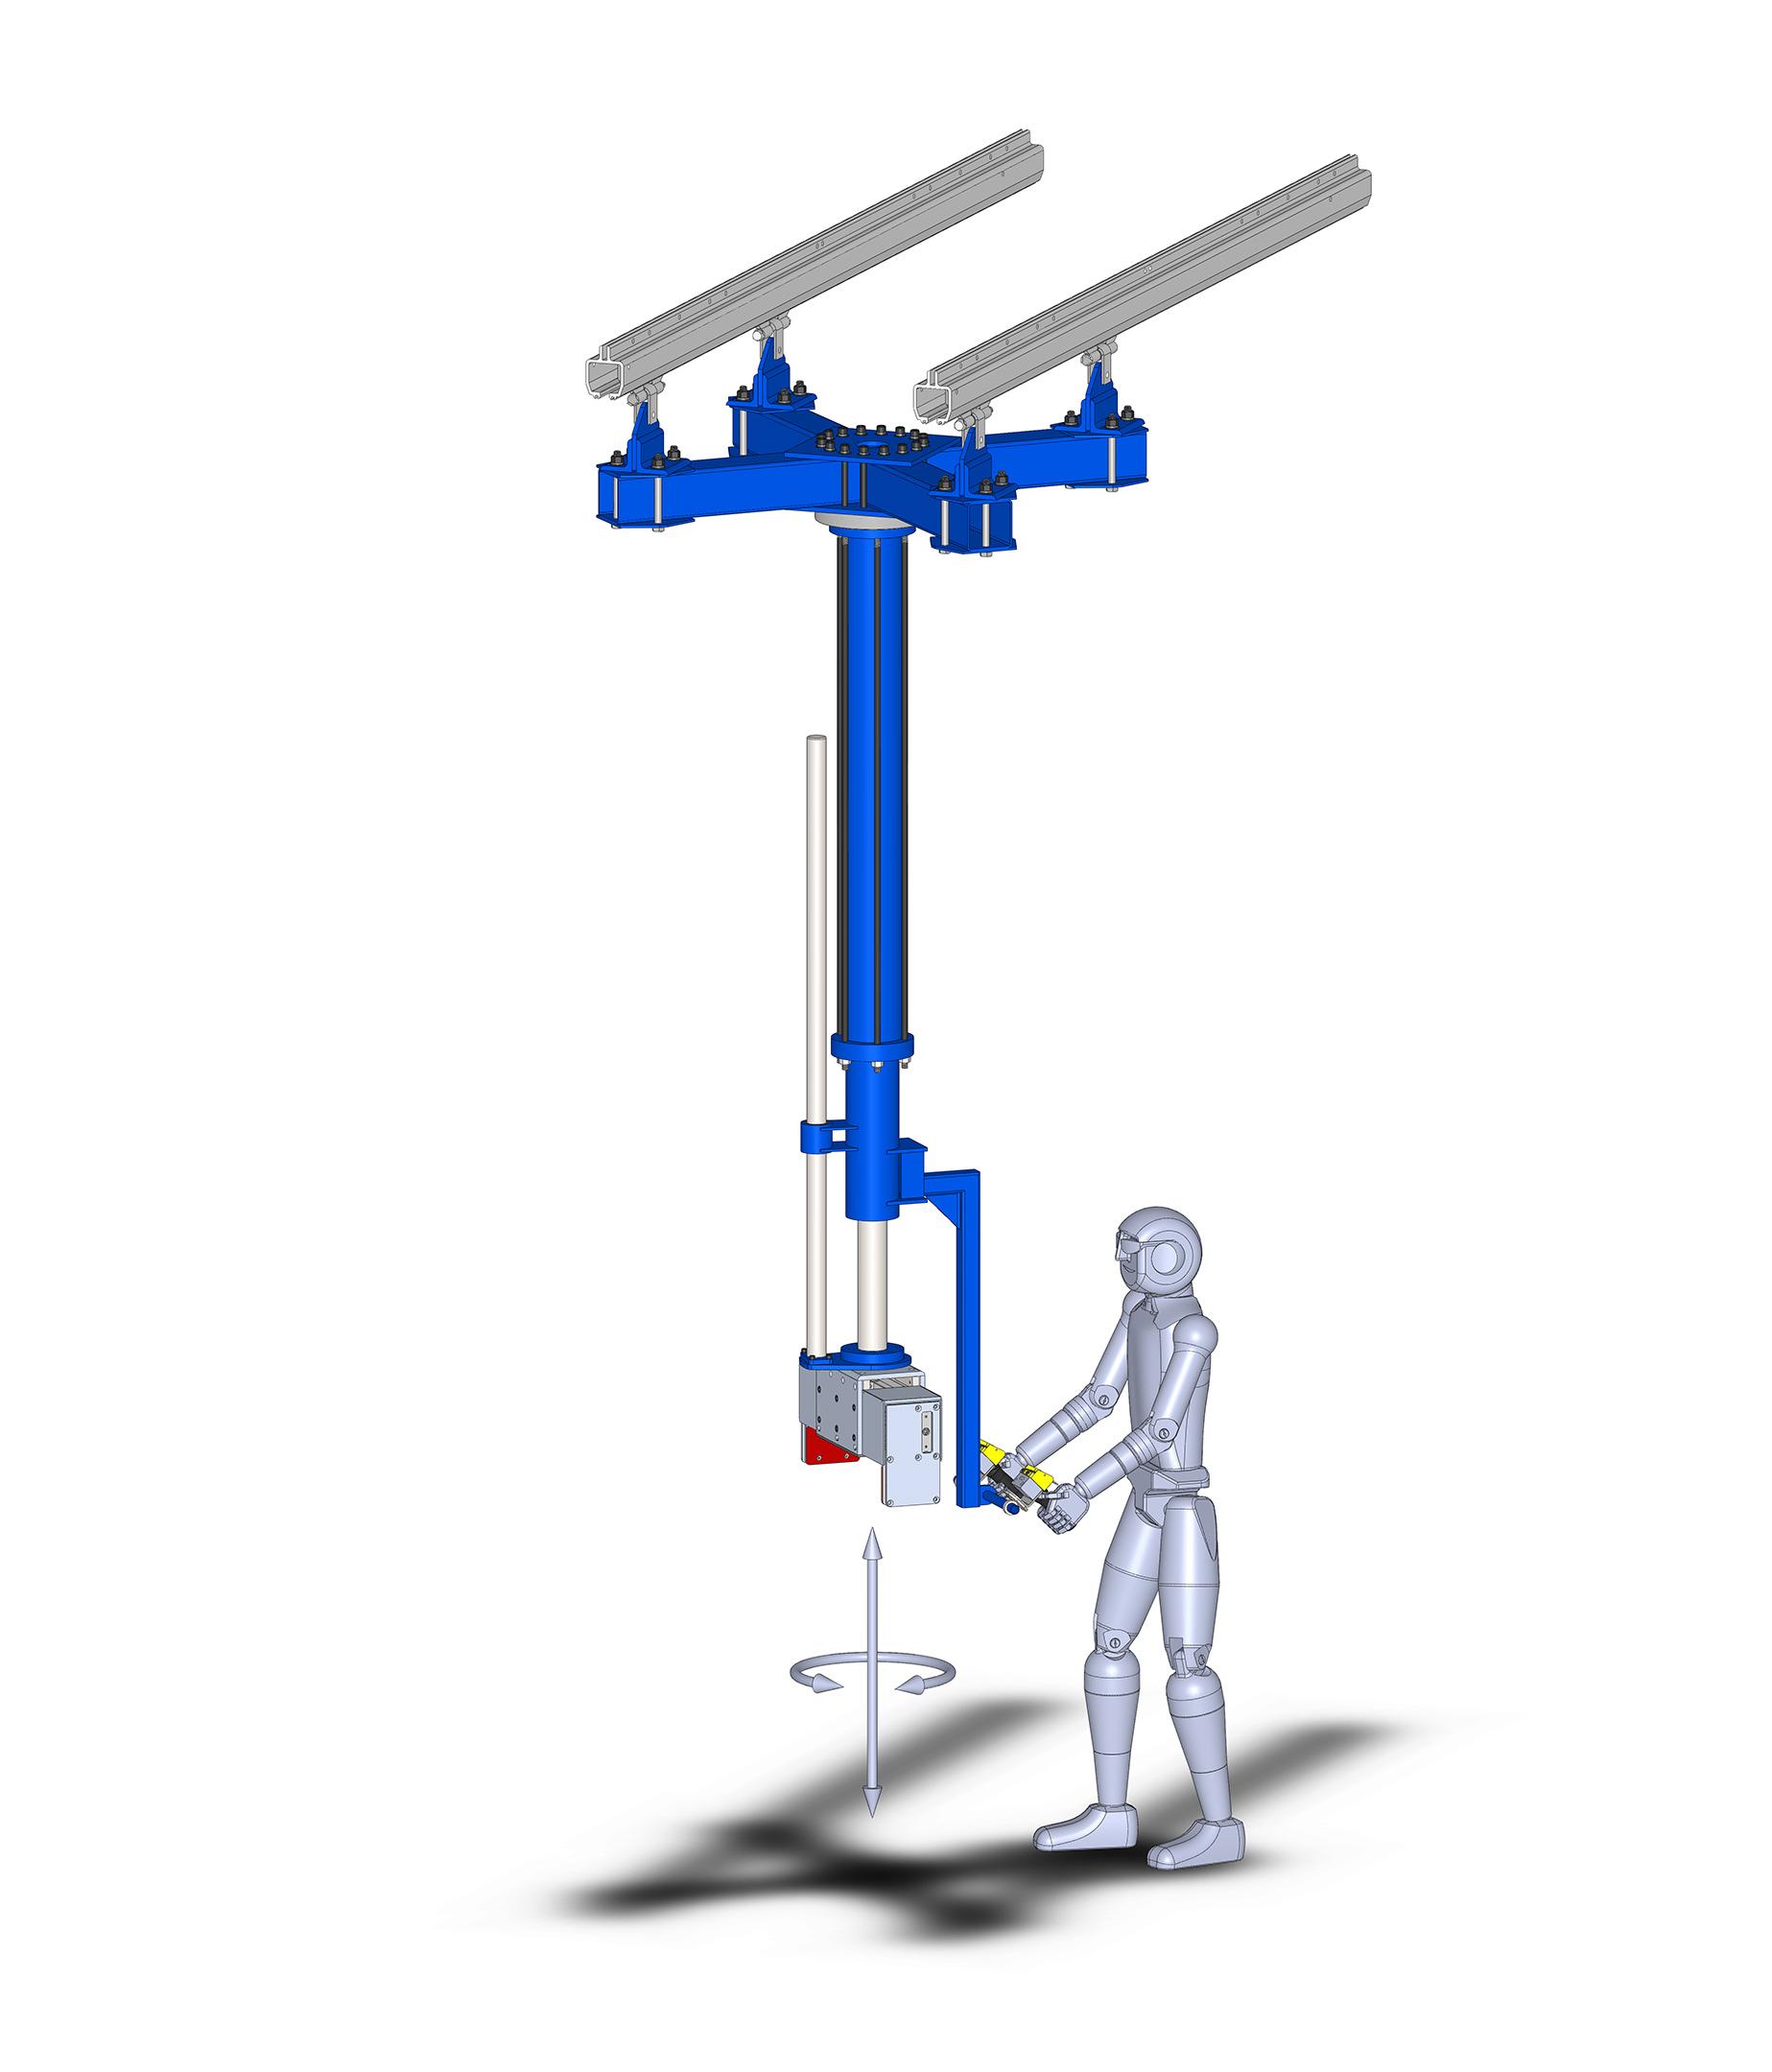 Pneumatic Manipulator Arms : Manipulator arms hydraulic pneumatic vertical lifters